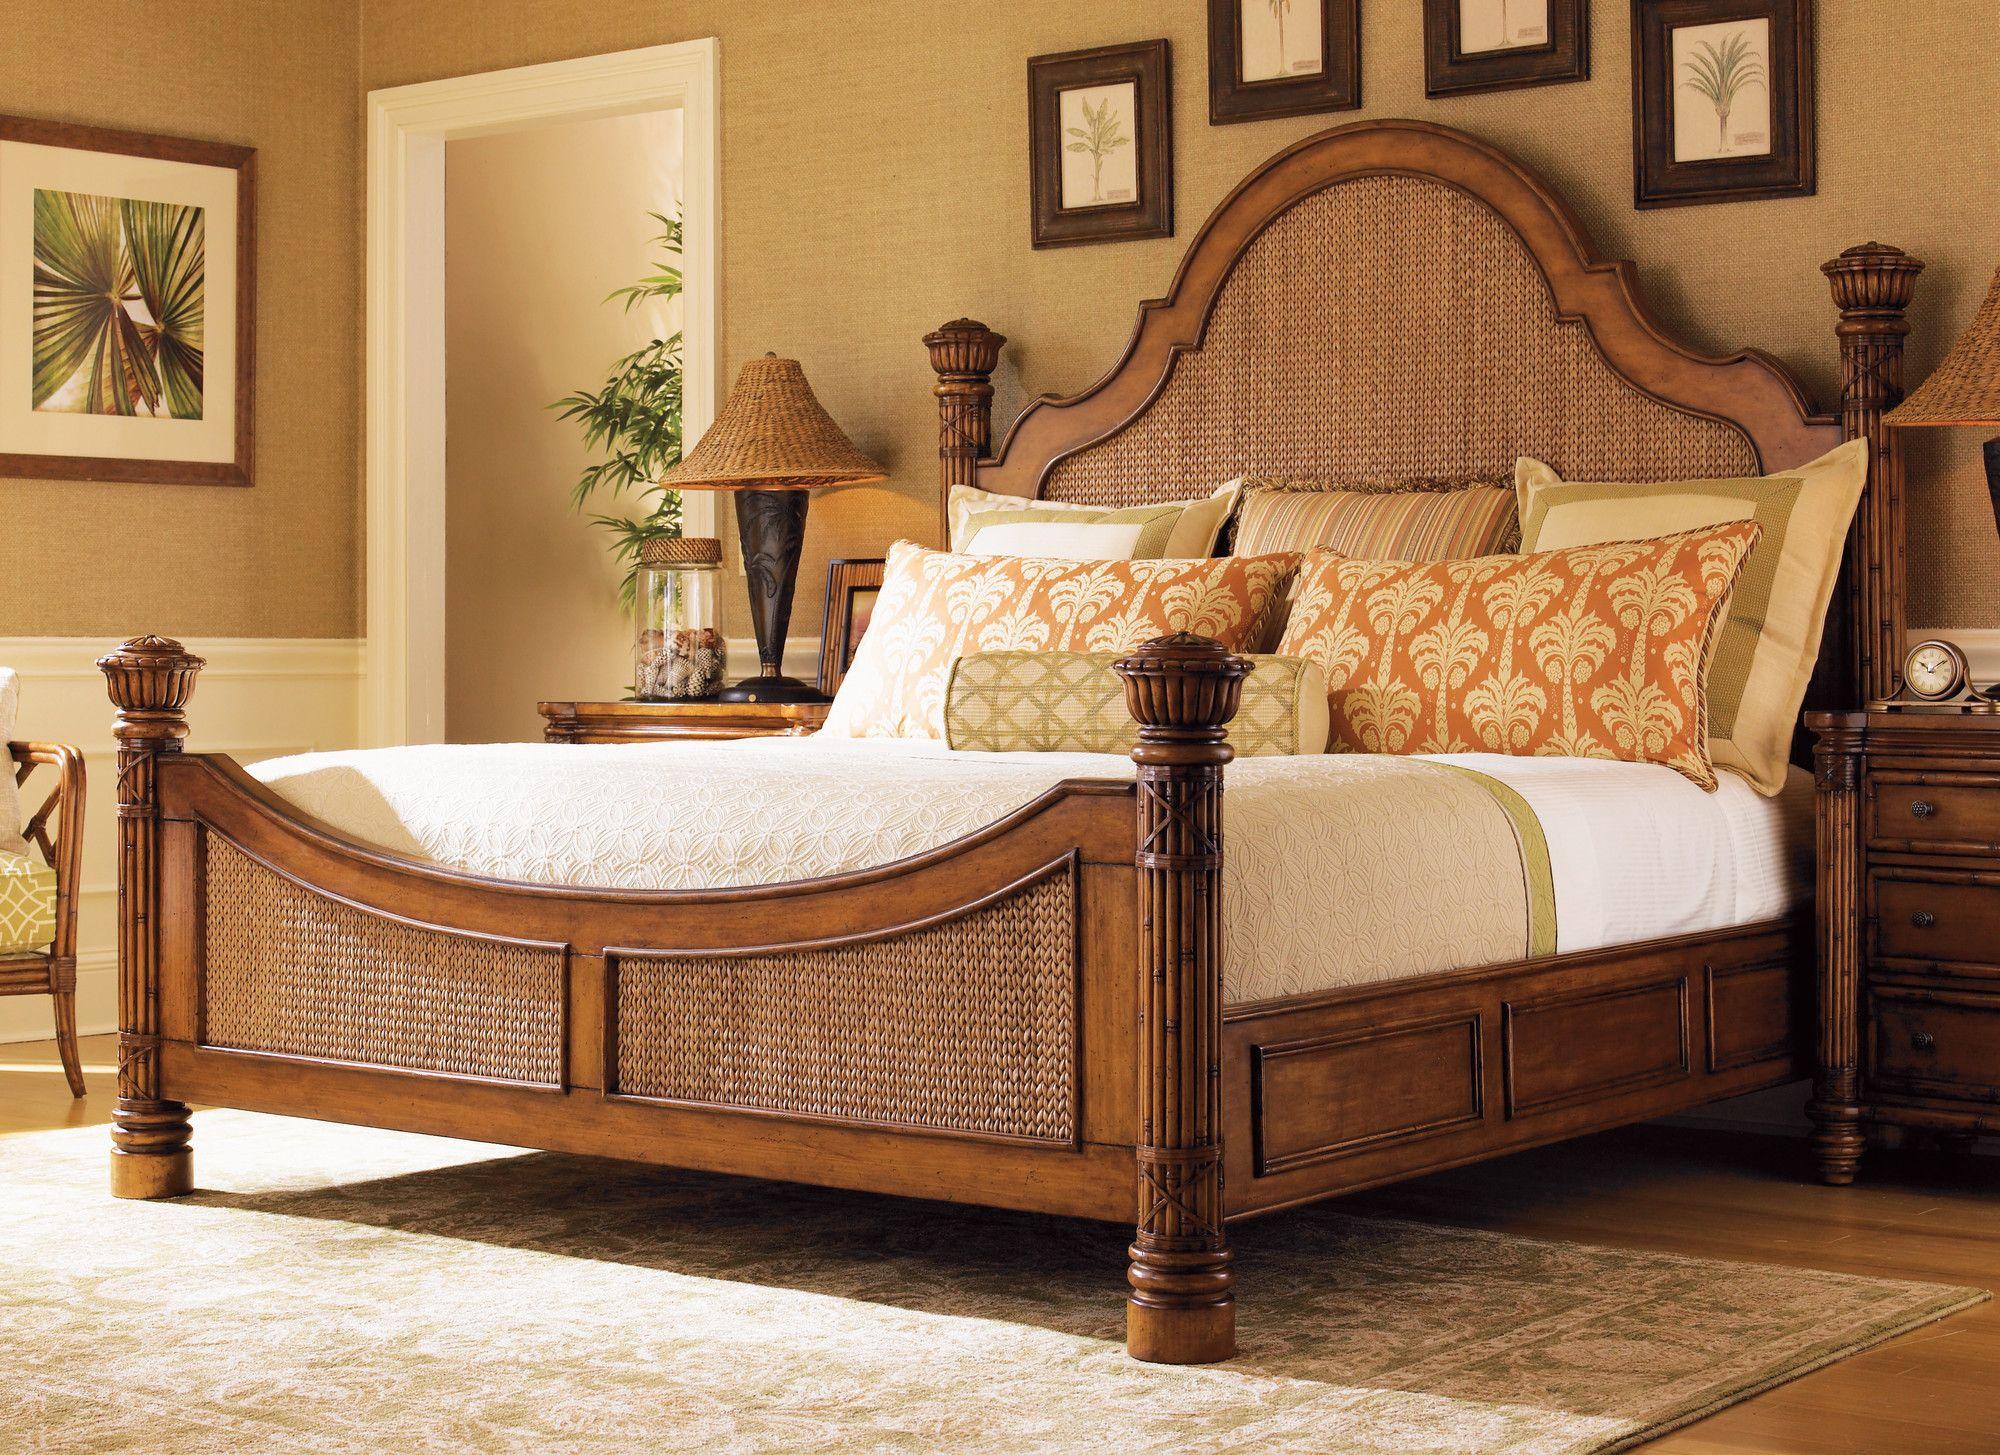 Island Estates Standard Bed | Tropical bedrooms, Bedroom ...